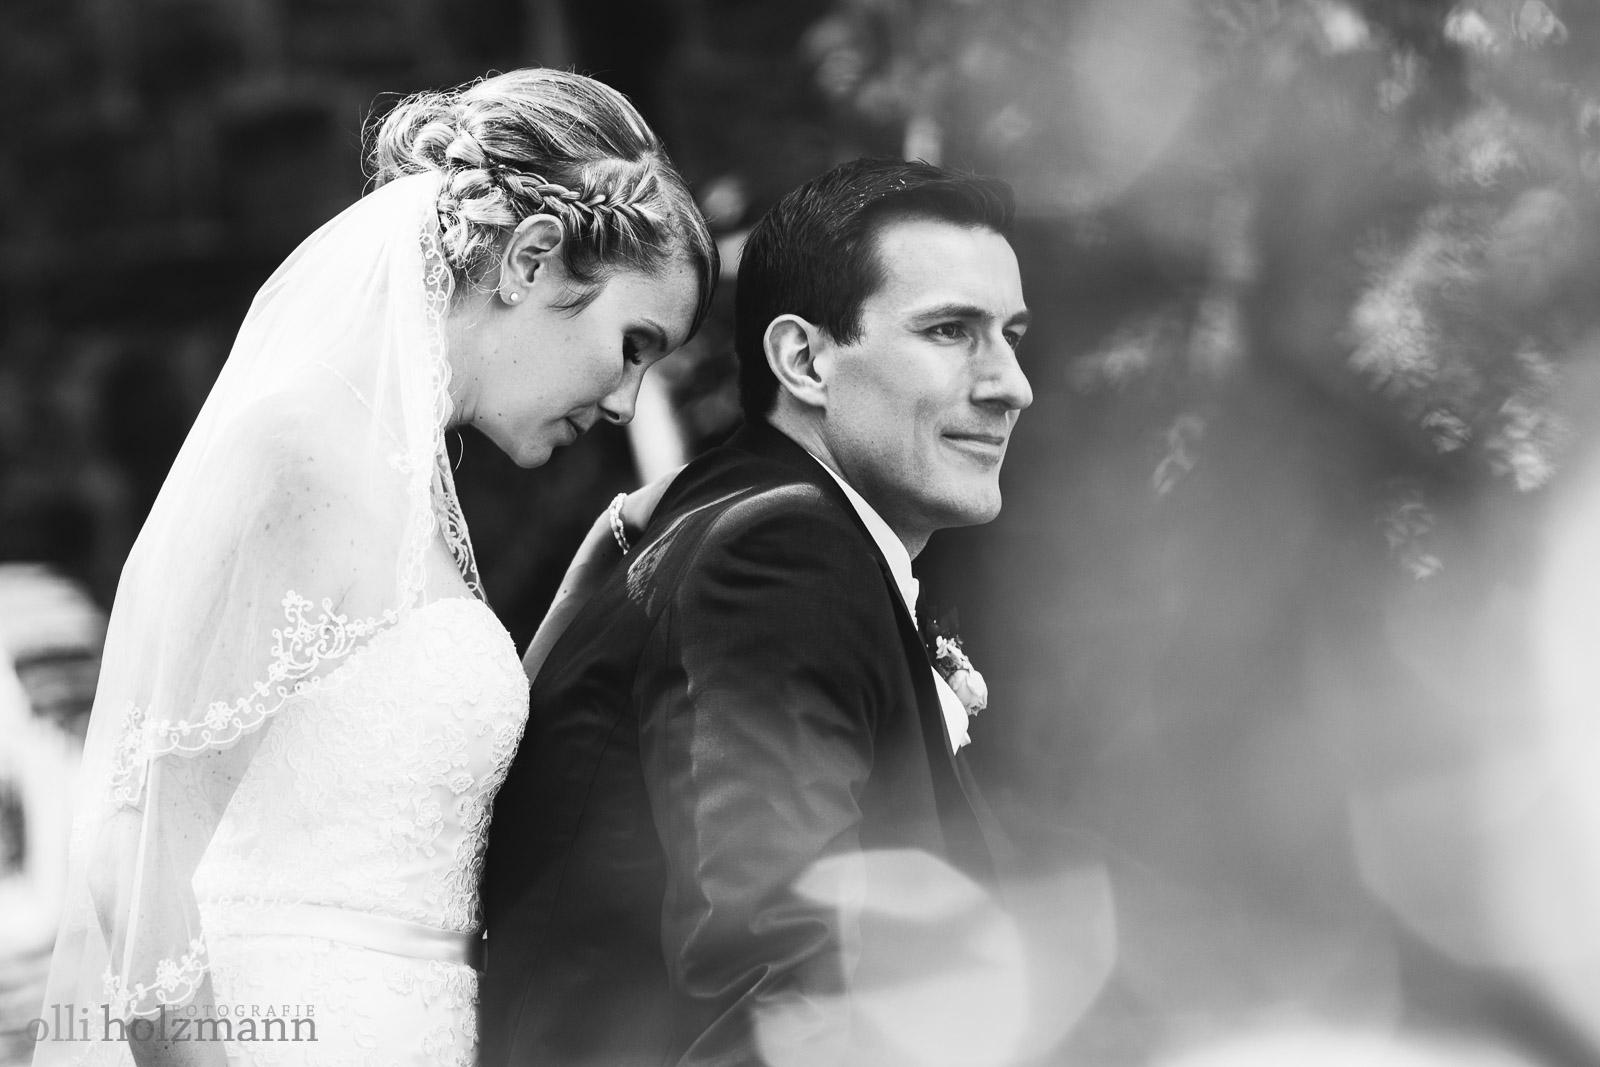 Hochzeitsfotograf nrw-75.jpg